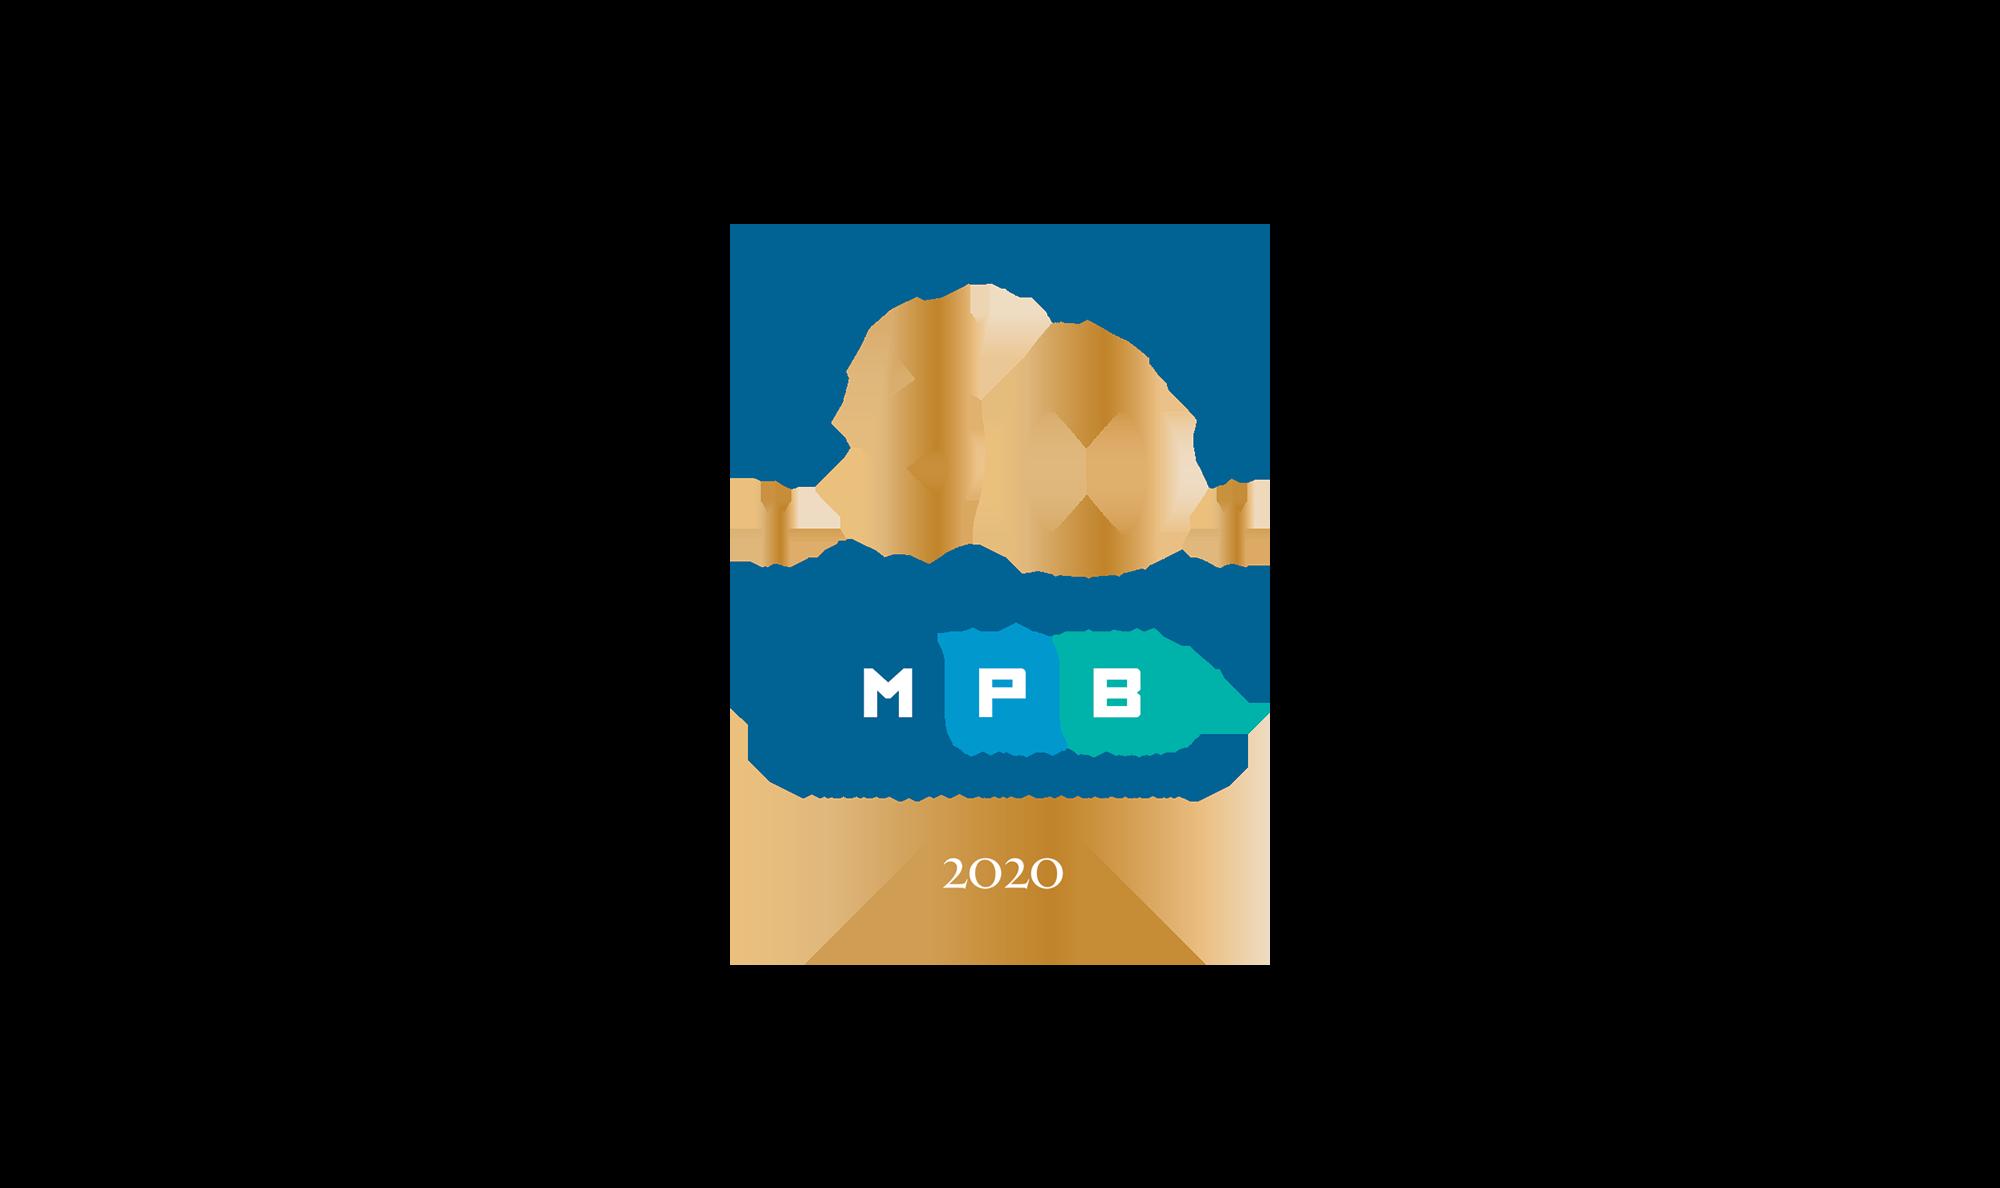 MPB Celebrating 50 Years of Service